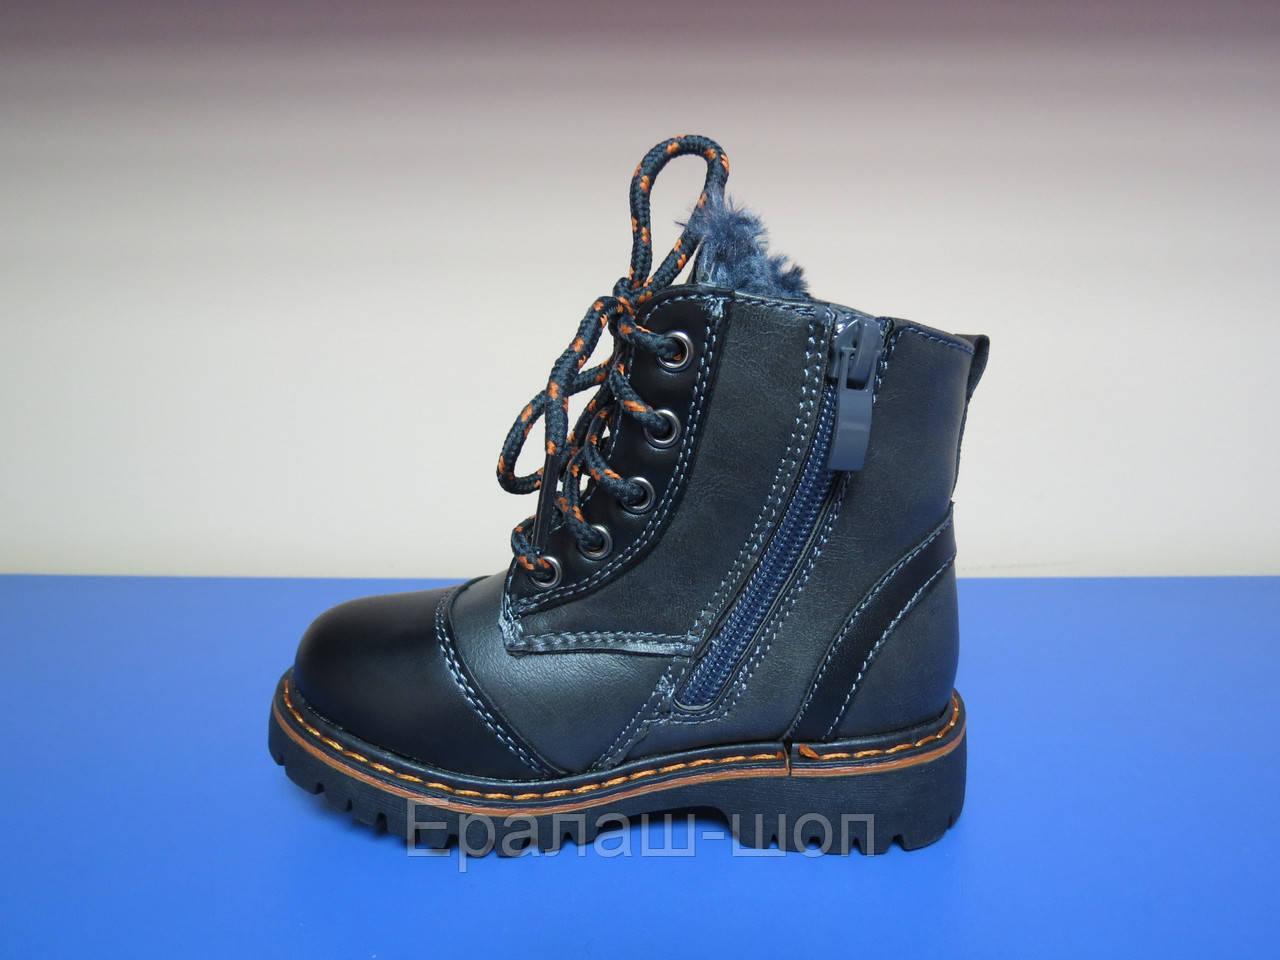 fc3cc0728 Распродажа!Зимние ботинки для мальчика 22р 24р, цена 336 грн., купить в  Днепре — Prom.ua (ID#175366813)